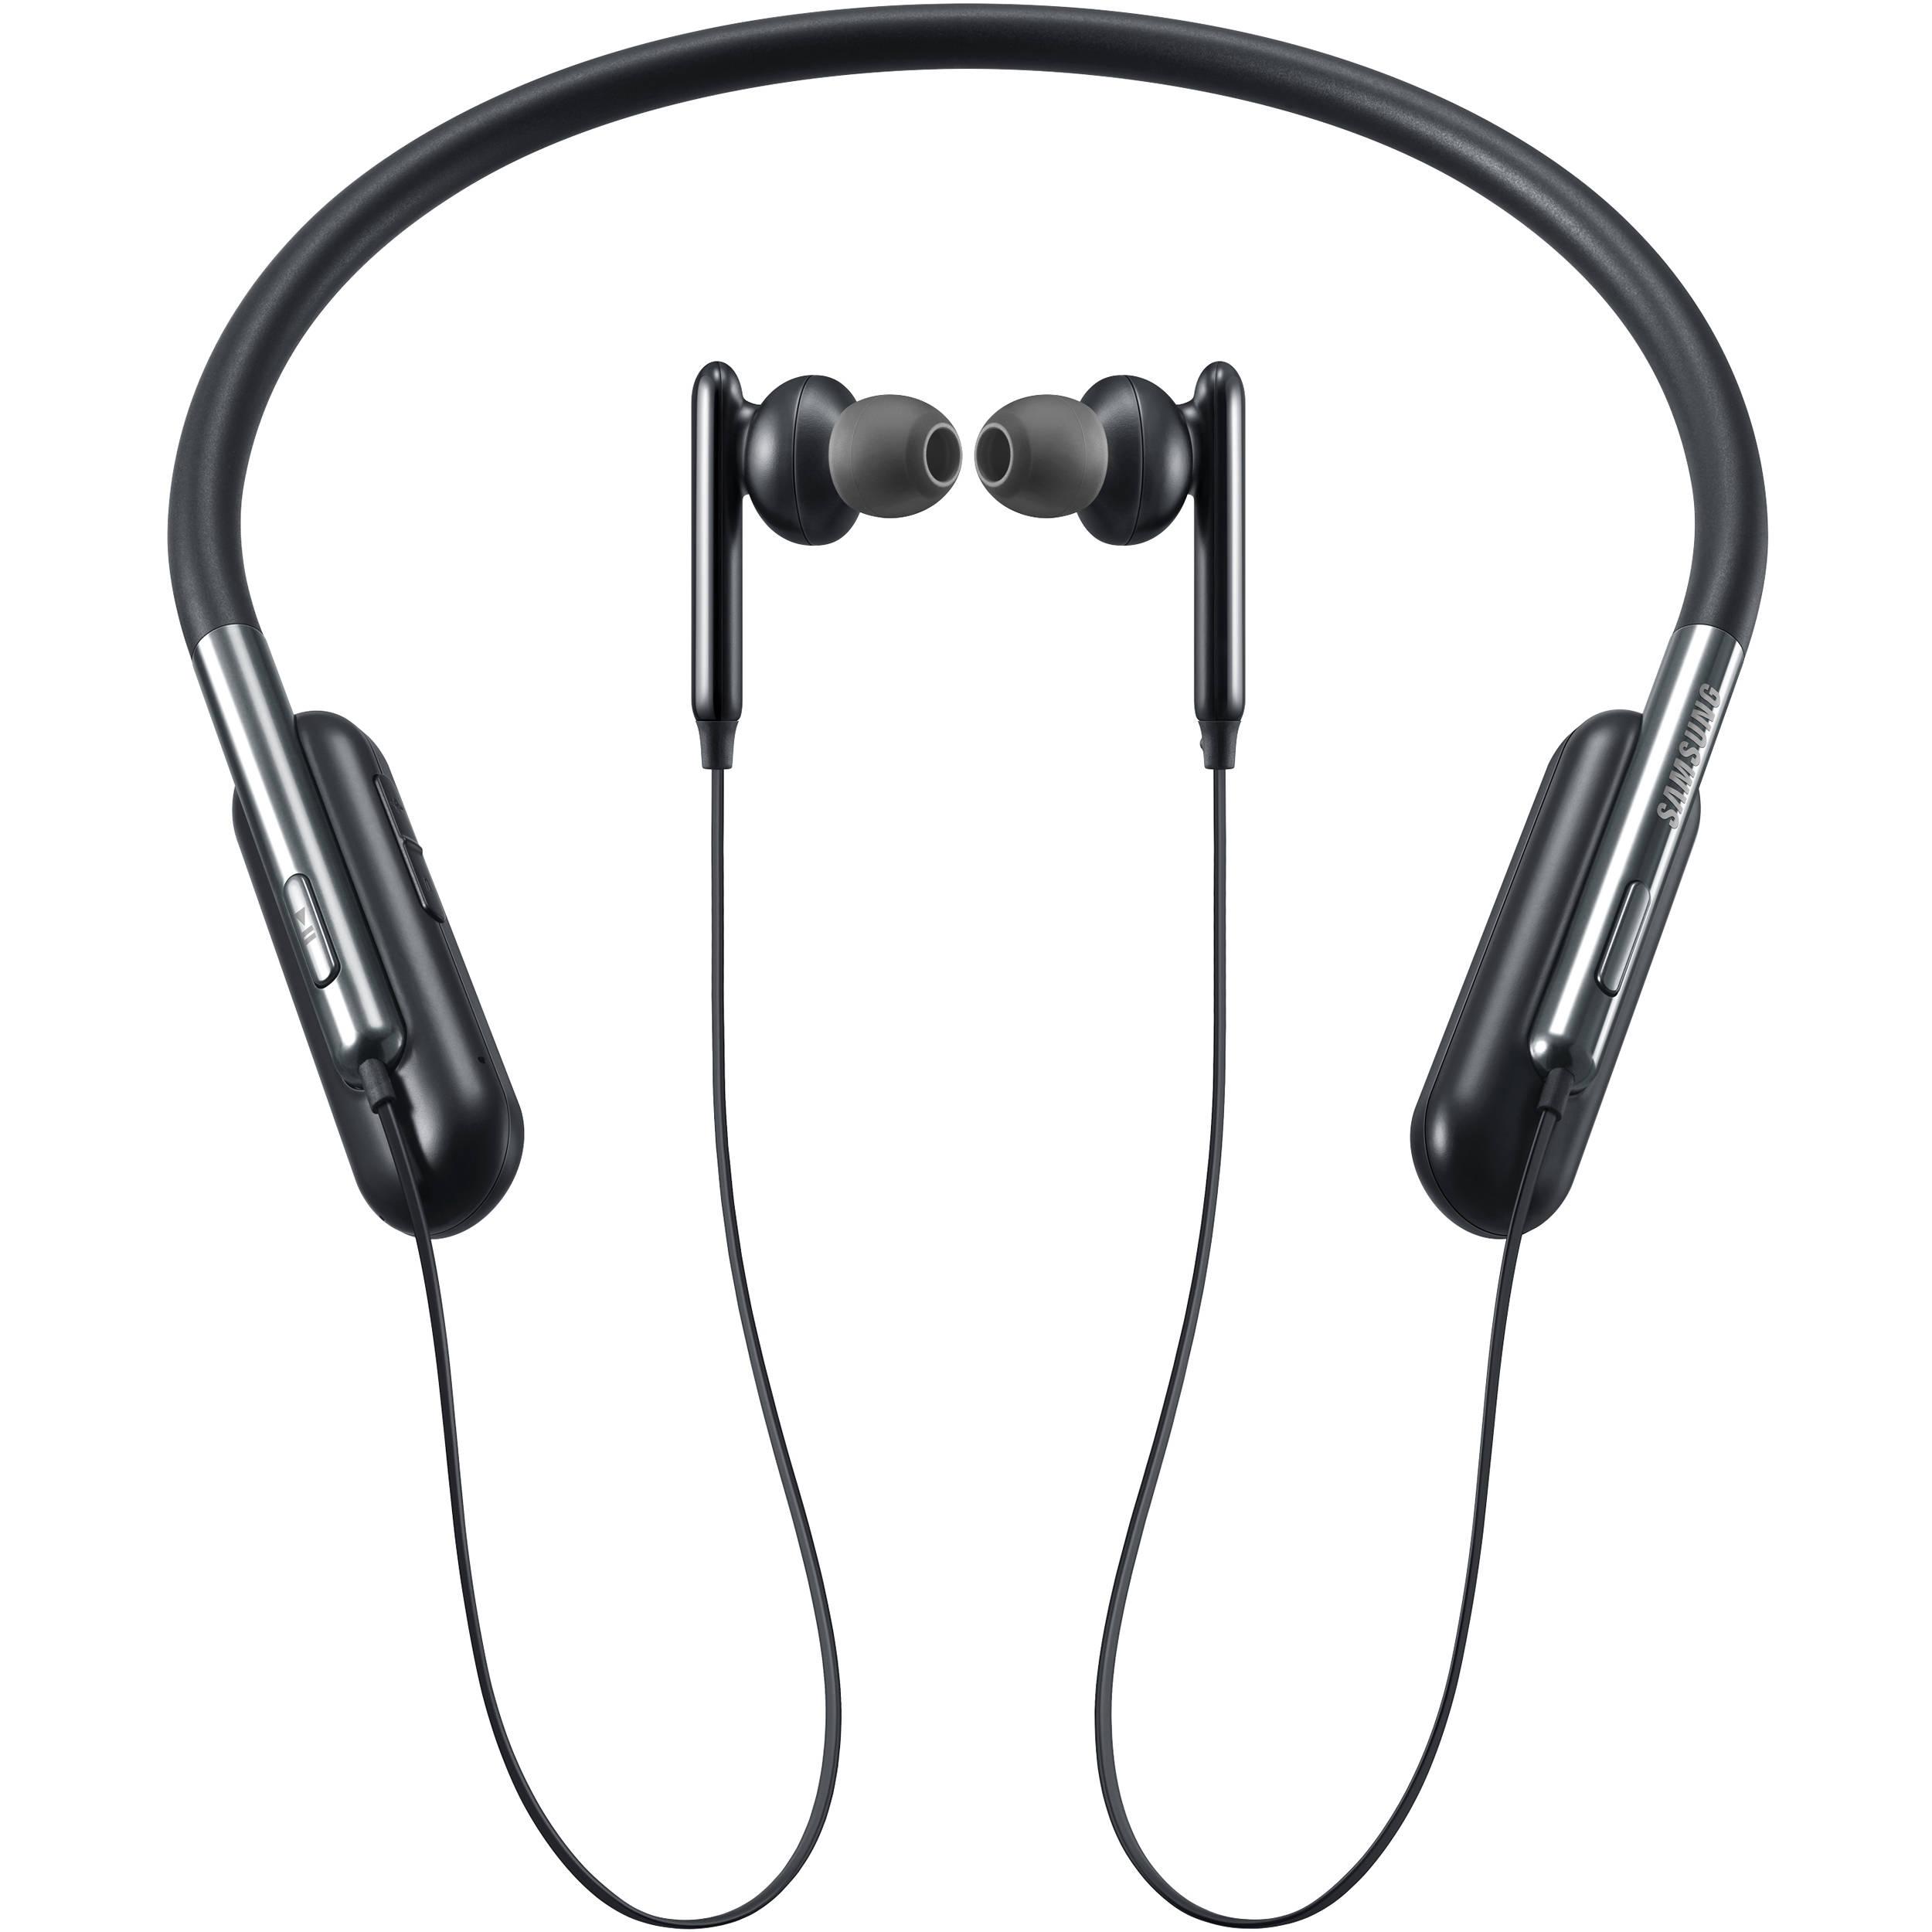 Used Samsung U Flex Bluetooth Wireless Headphones EO